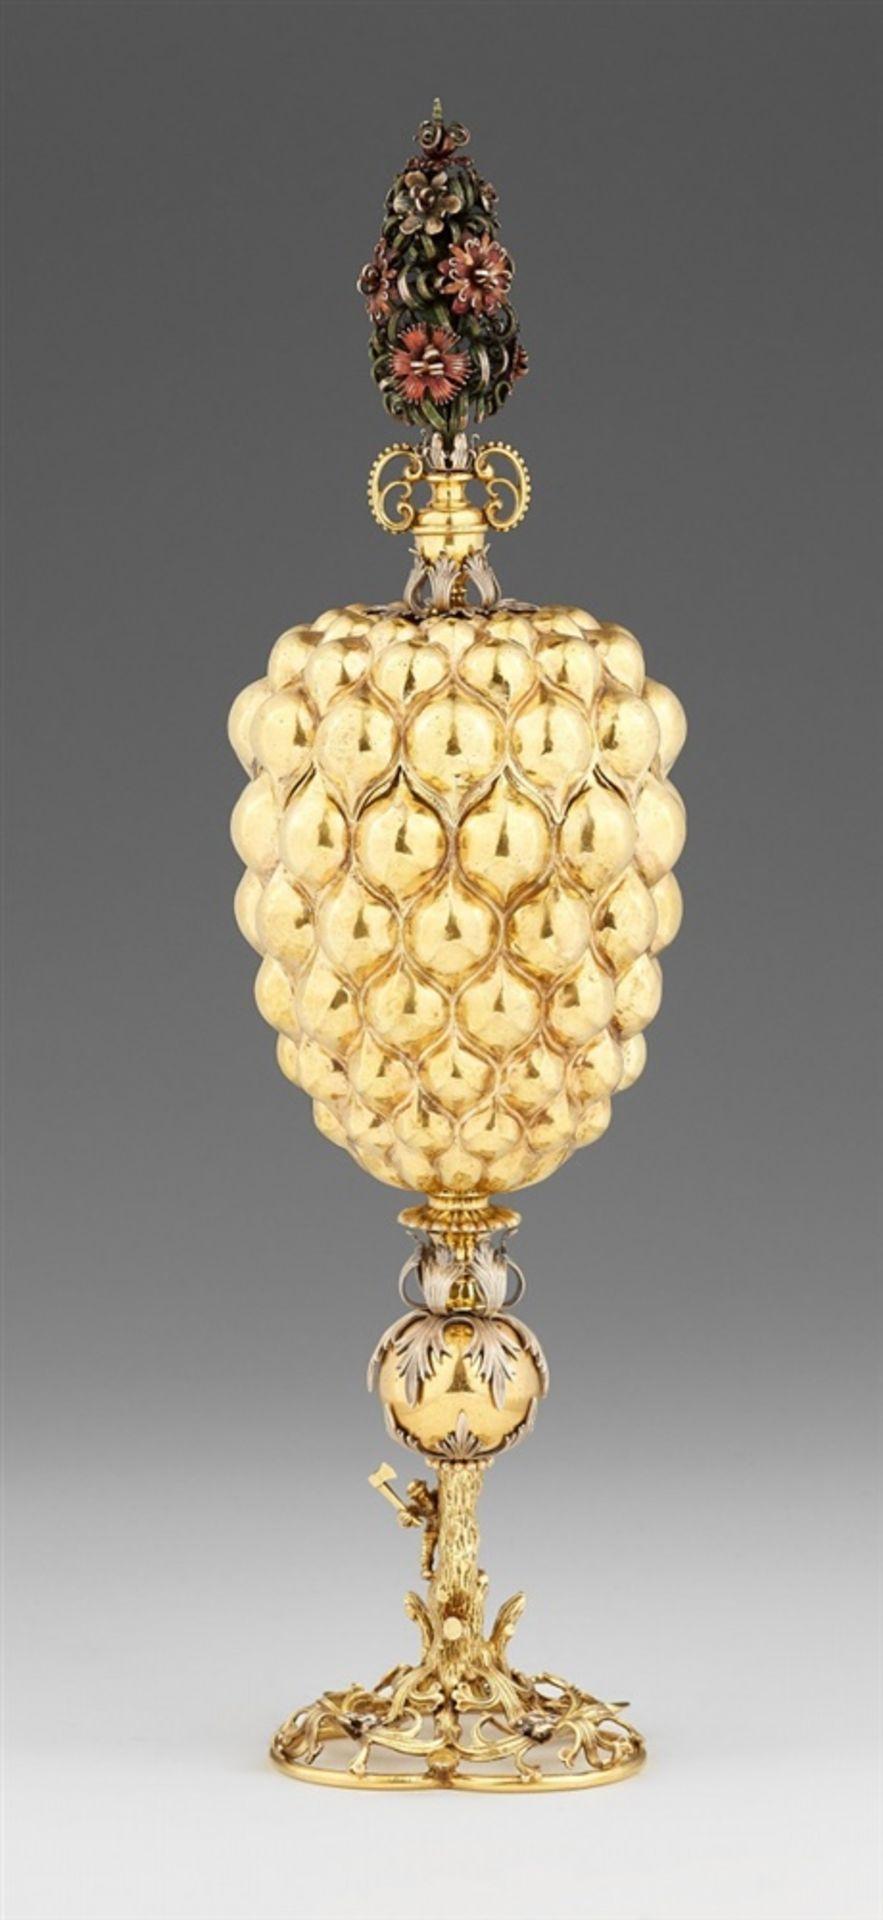 Los 703 - An important Renaissance polychromed silver gobletSilber; vergoldet. Silver-gilt cup on a pierced